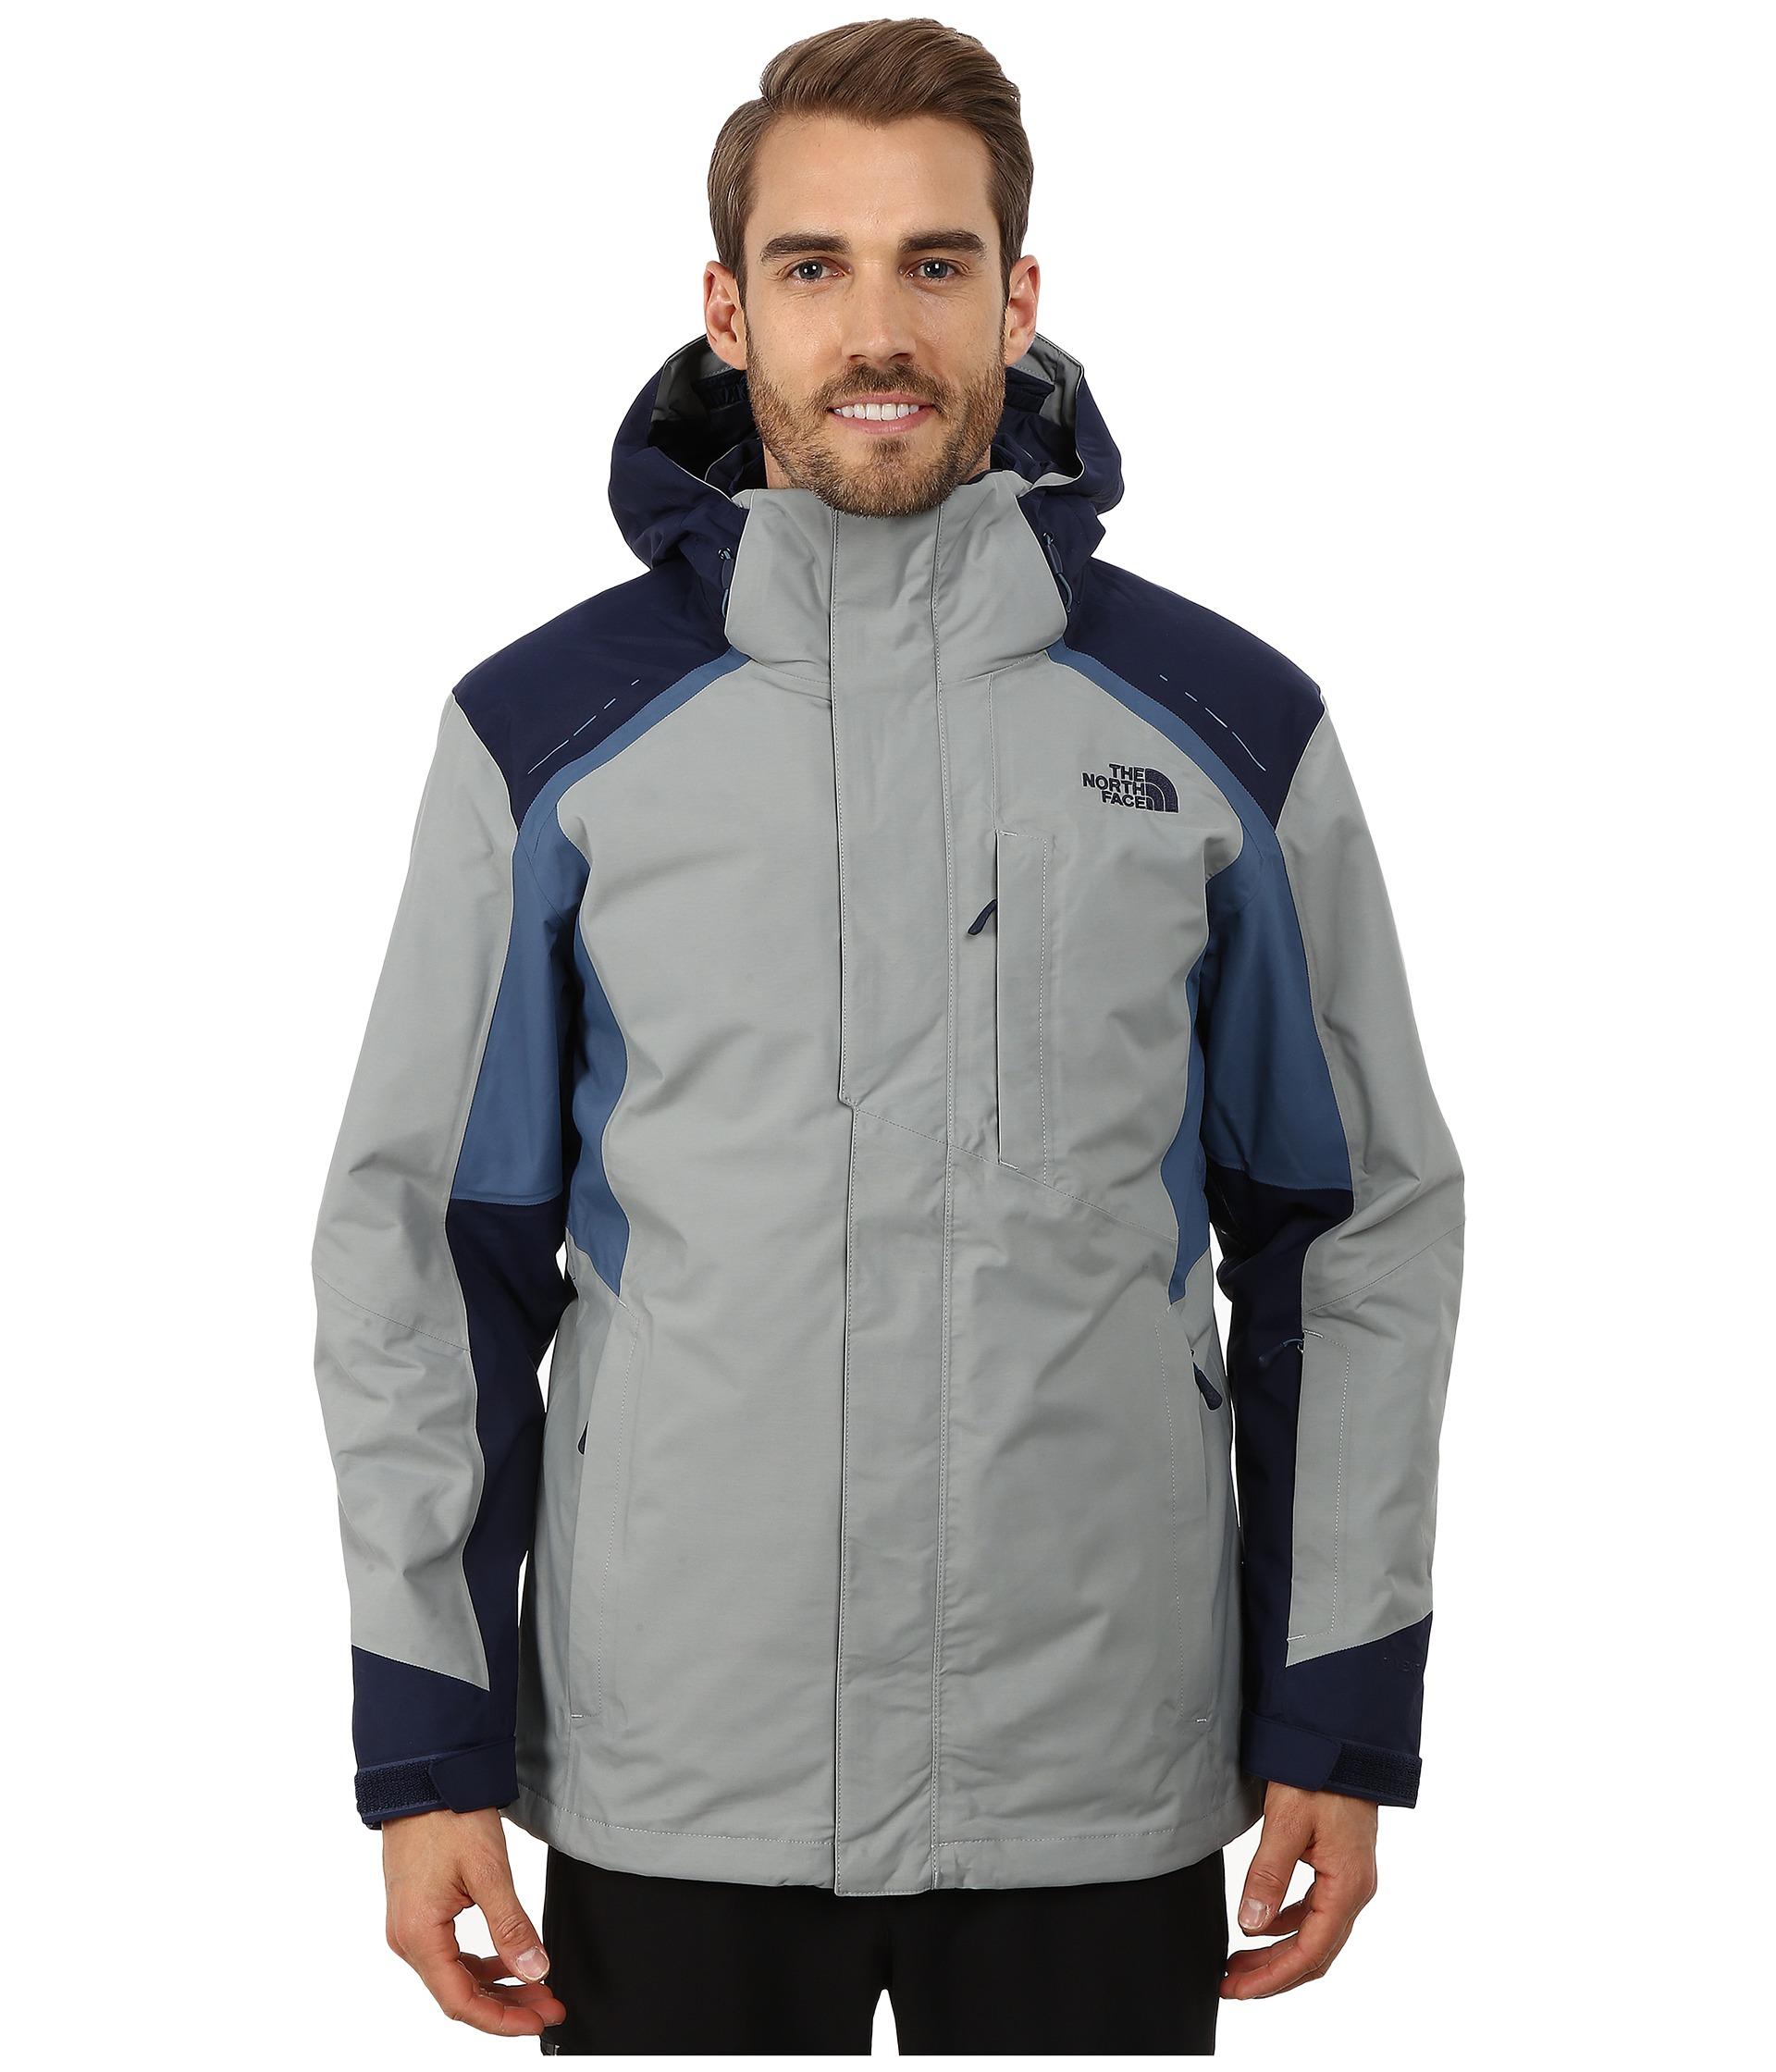 the north face mens vortex jacket - Marwood VeneerMarwood Veneer 1a29f14ca